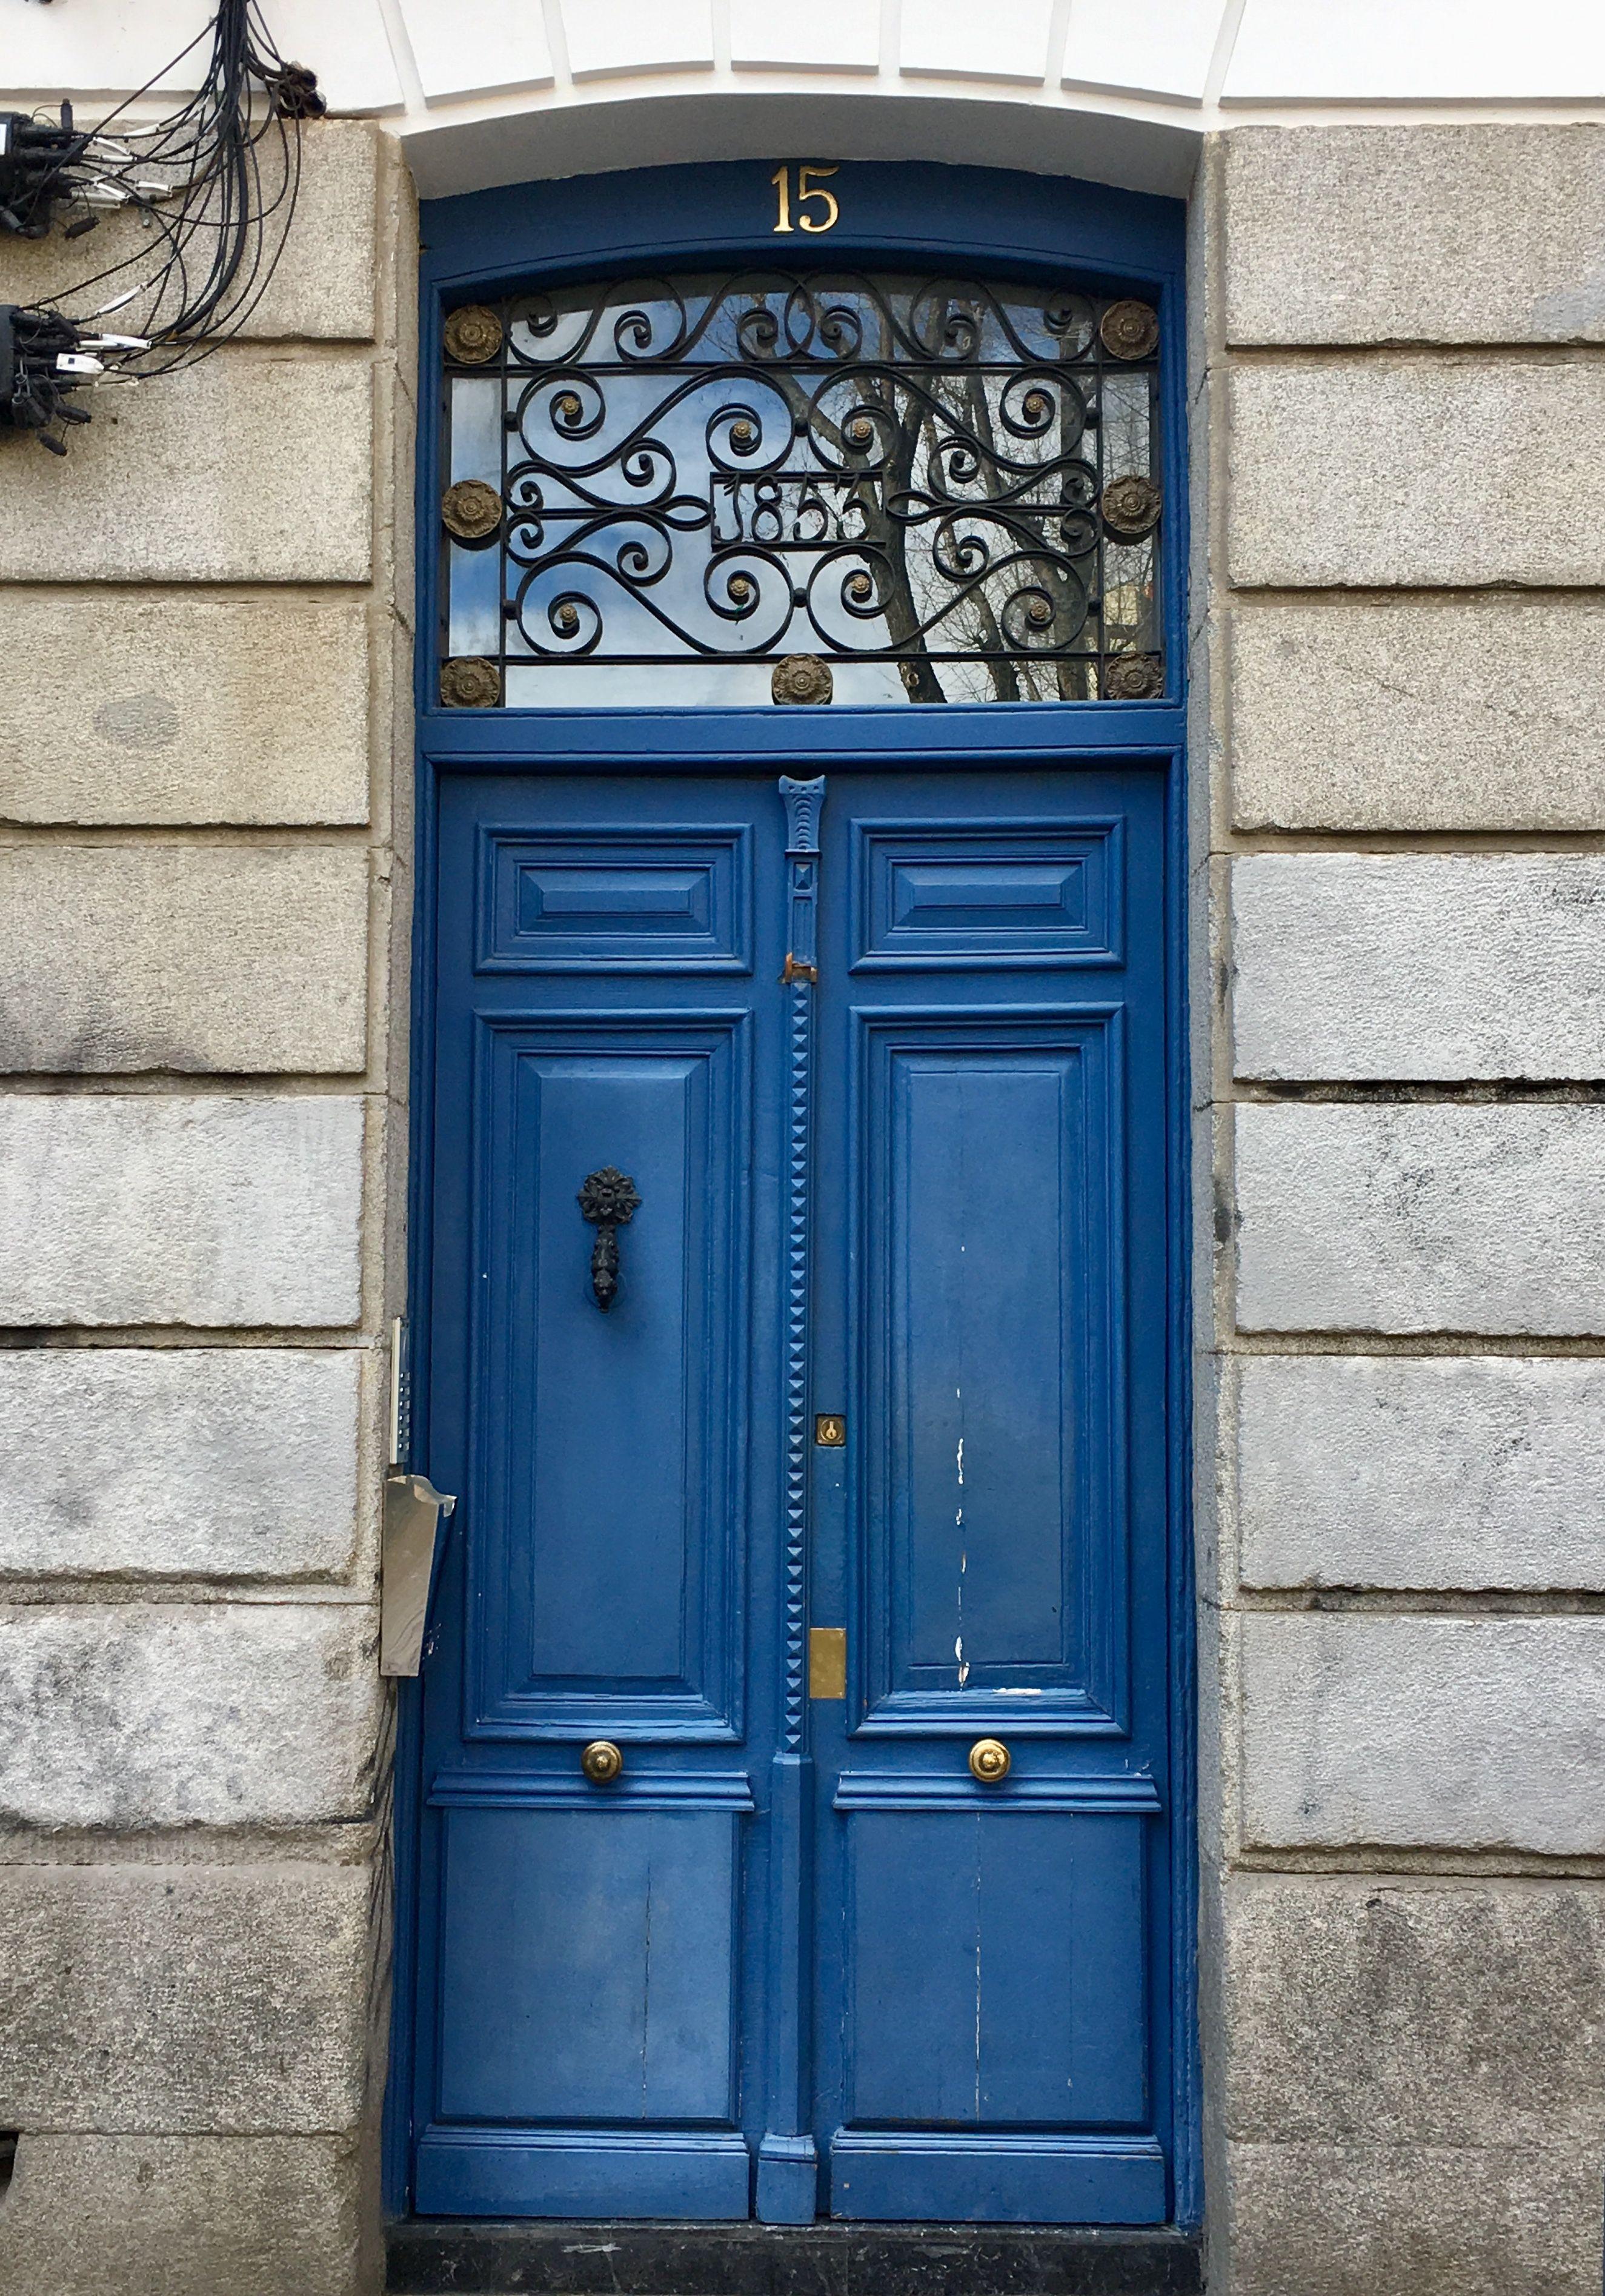 Puerta en chueca madrid i hear you knocking on my blue door